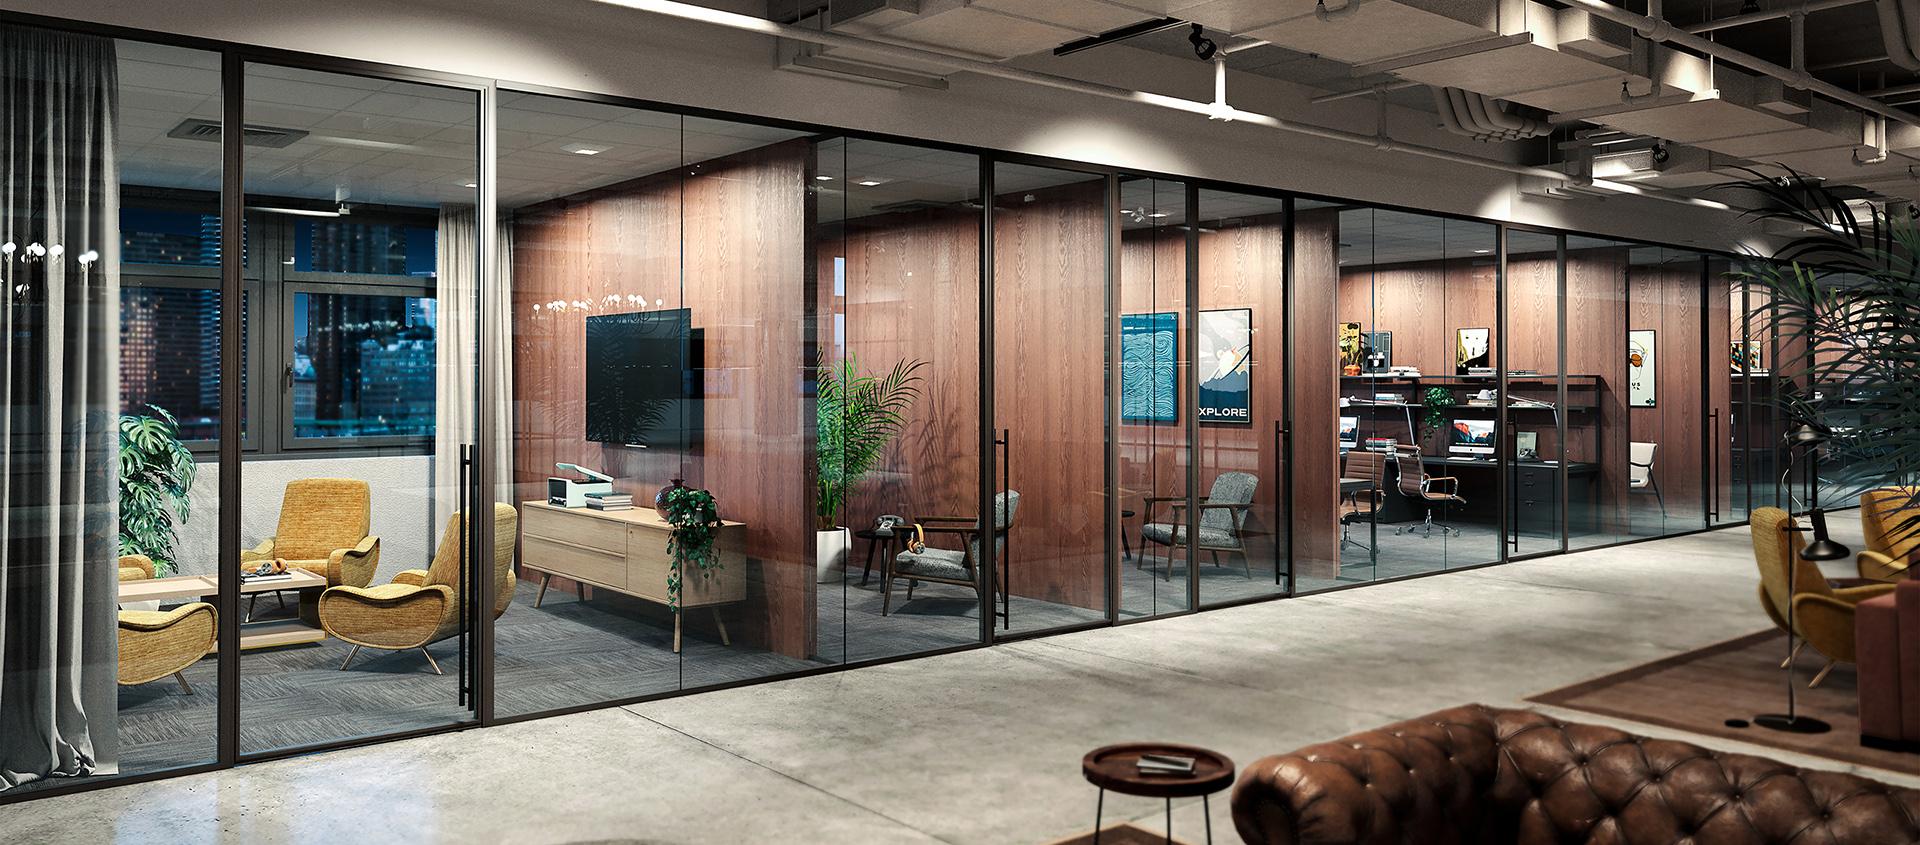 Modernus dark framed glass walls